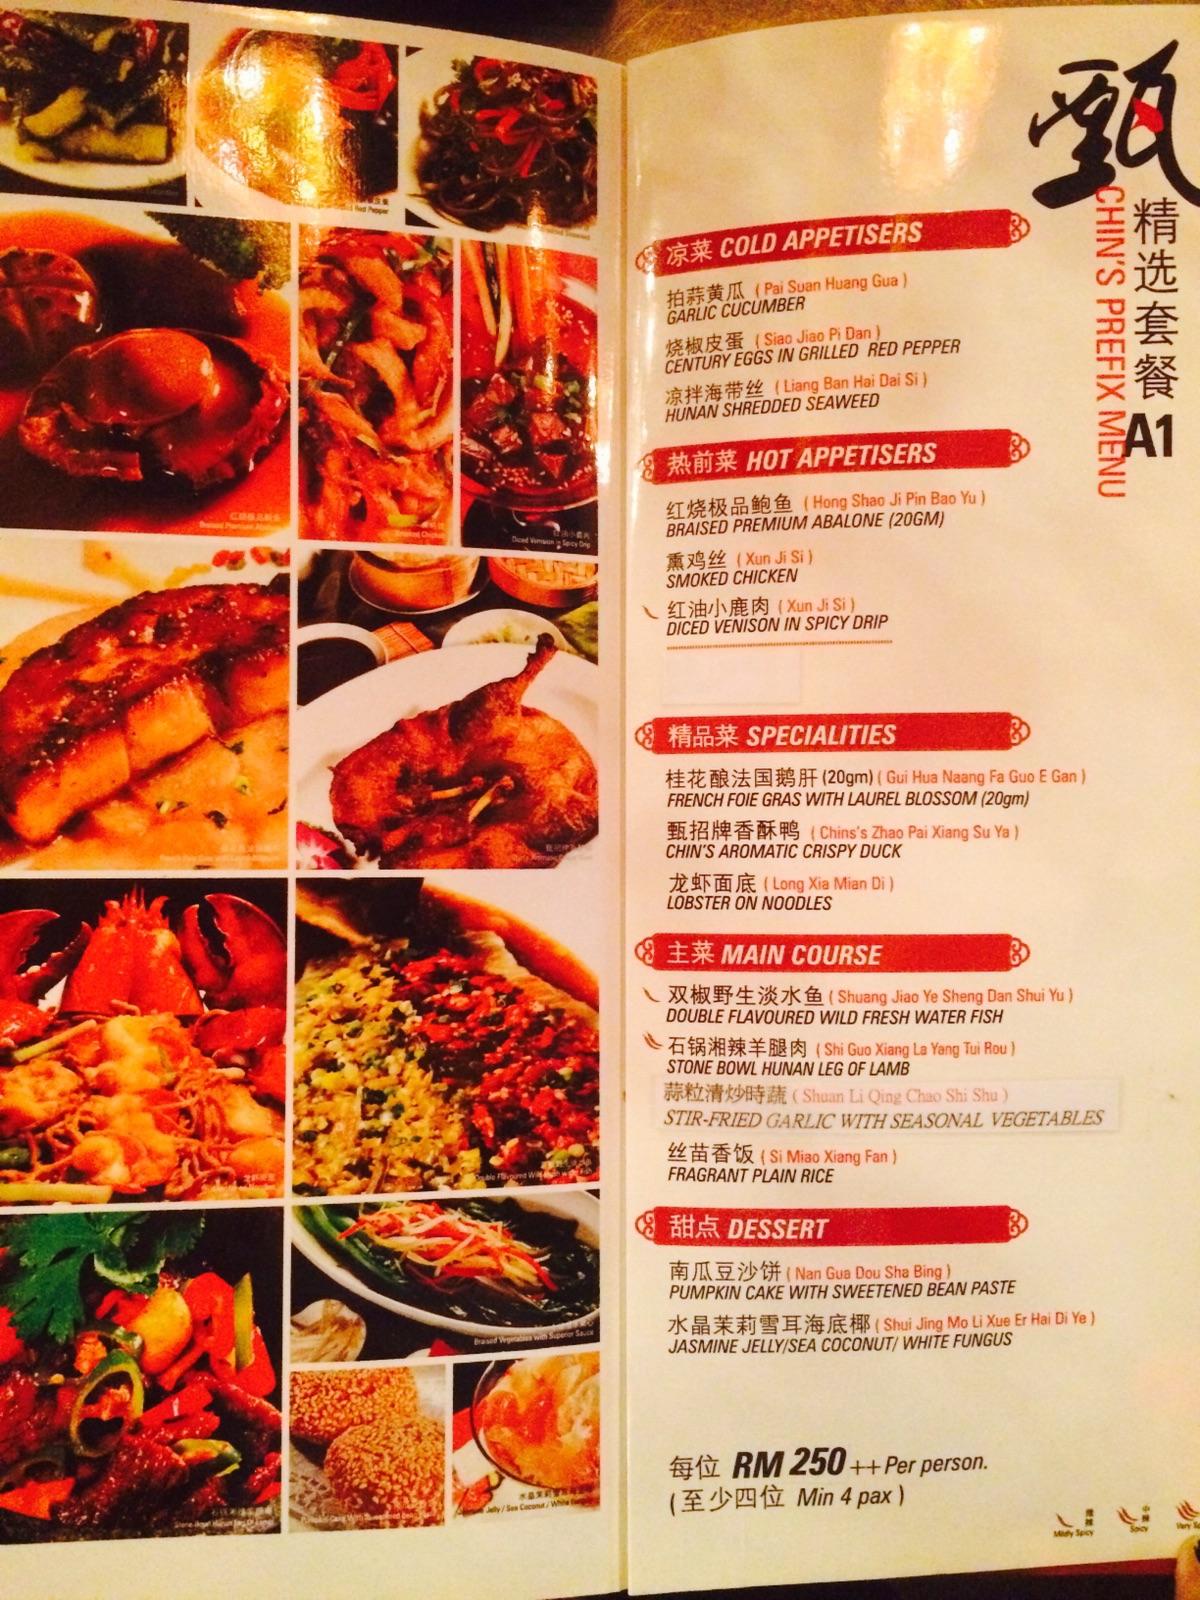 Stylish chins chinese cuisine photos